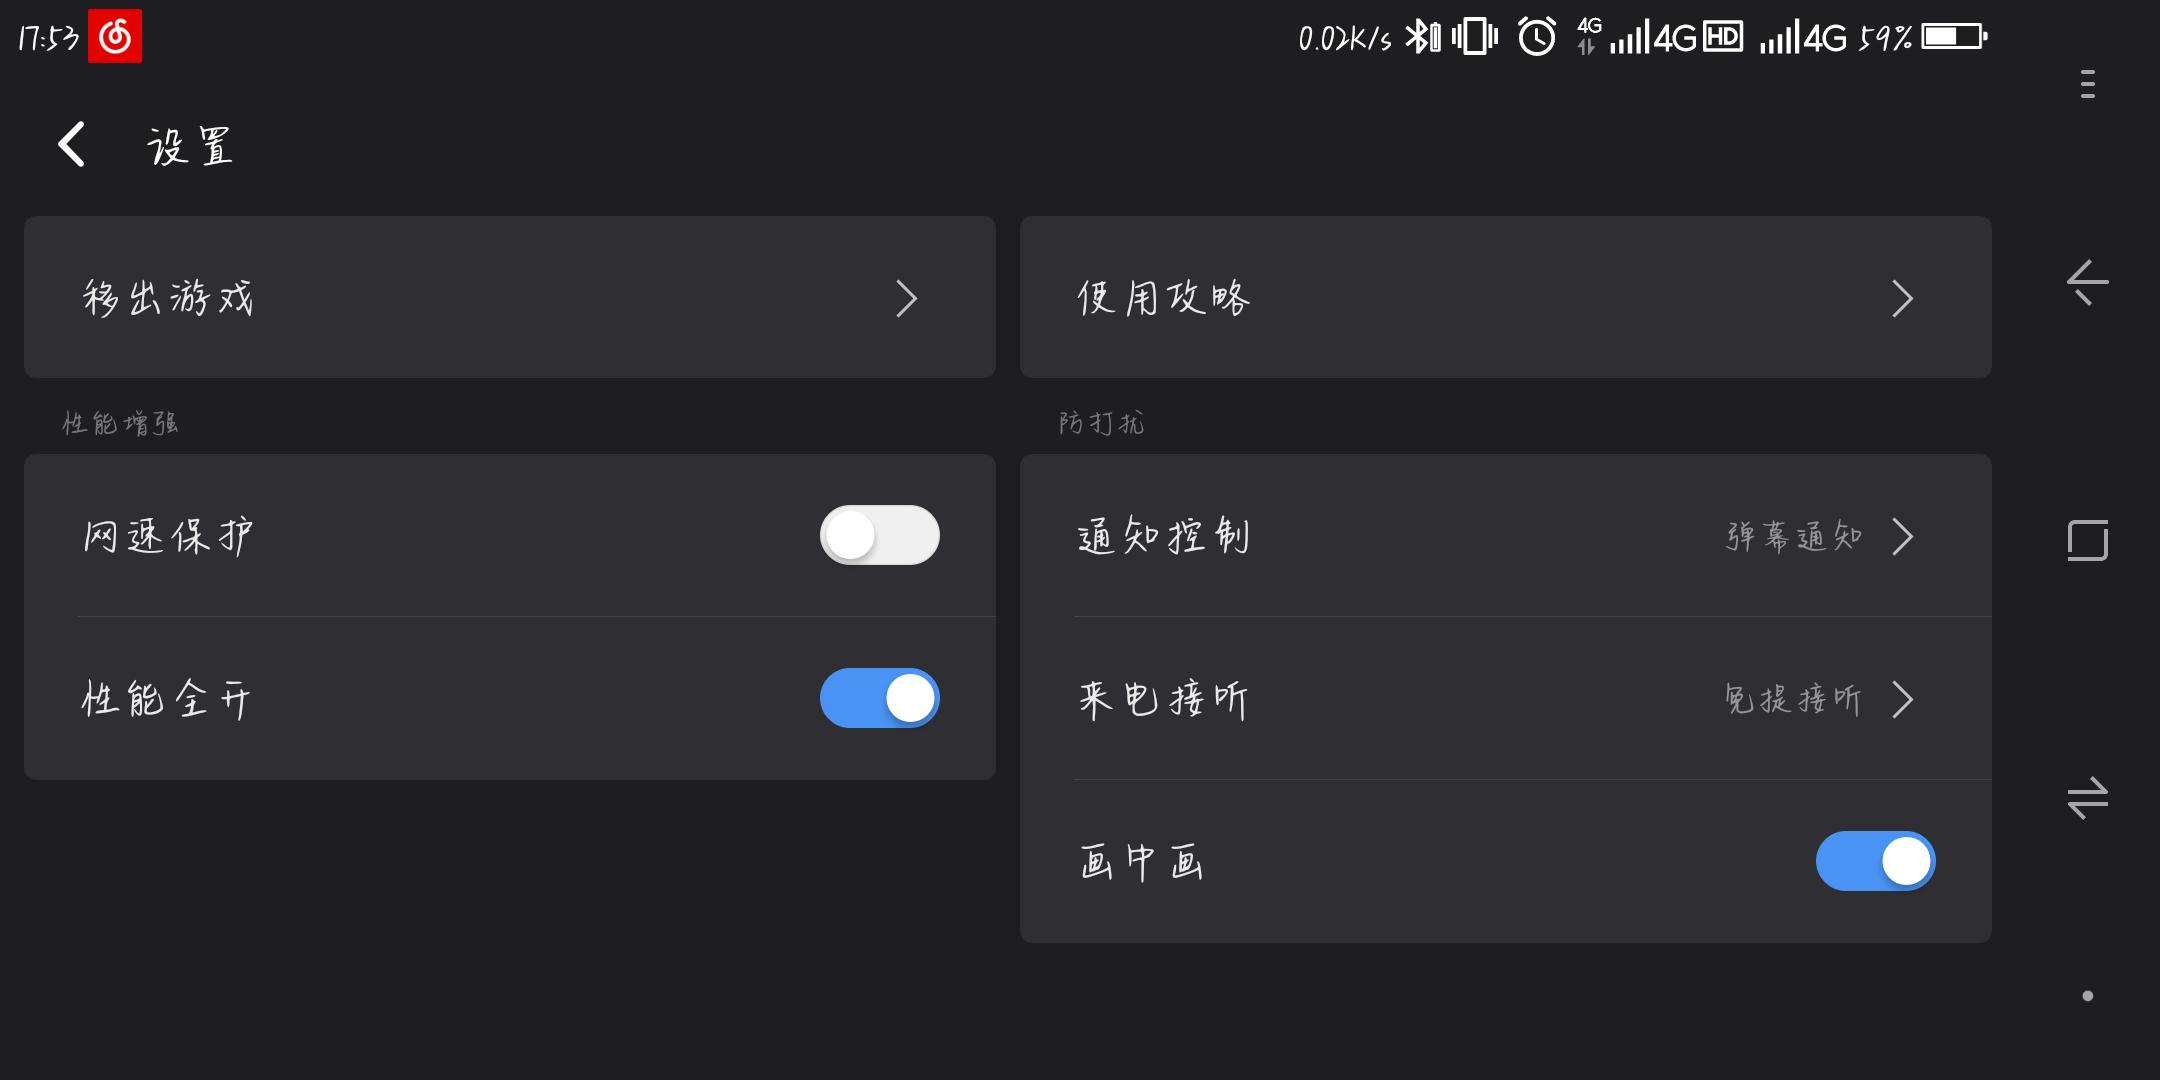 Screenshot_2019-05-09-17-54-04.png